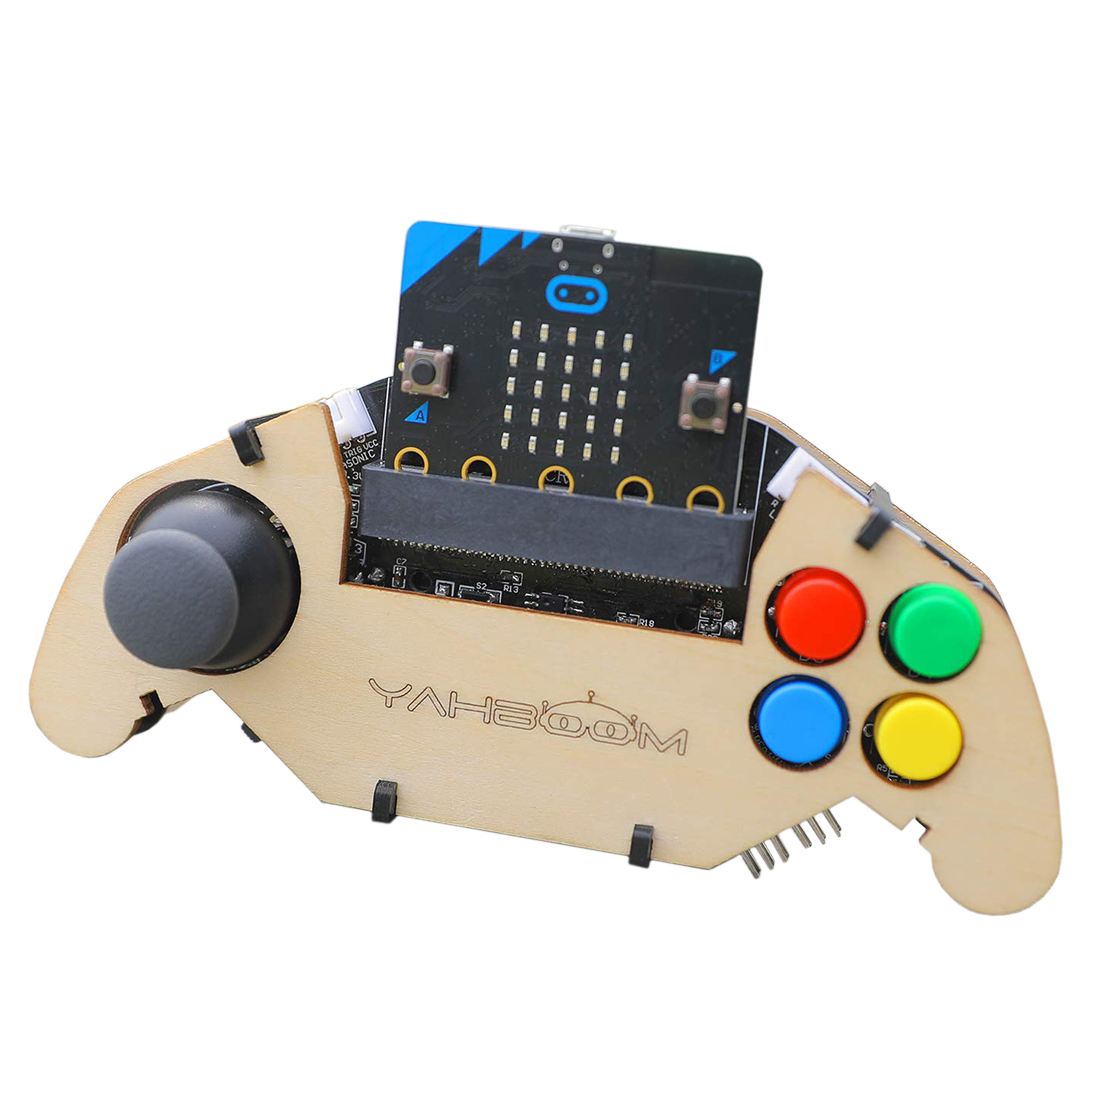 Hot MIcro:Bit Gamepad Expansion Board Handle Microbit Robot Car Joystick STEM Toys Programming Game Controller (Micro:Bit Board)